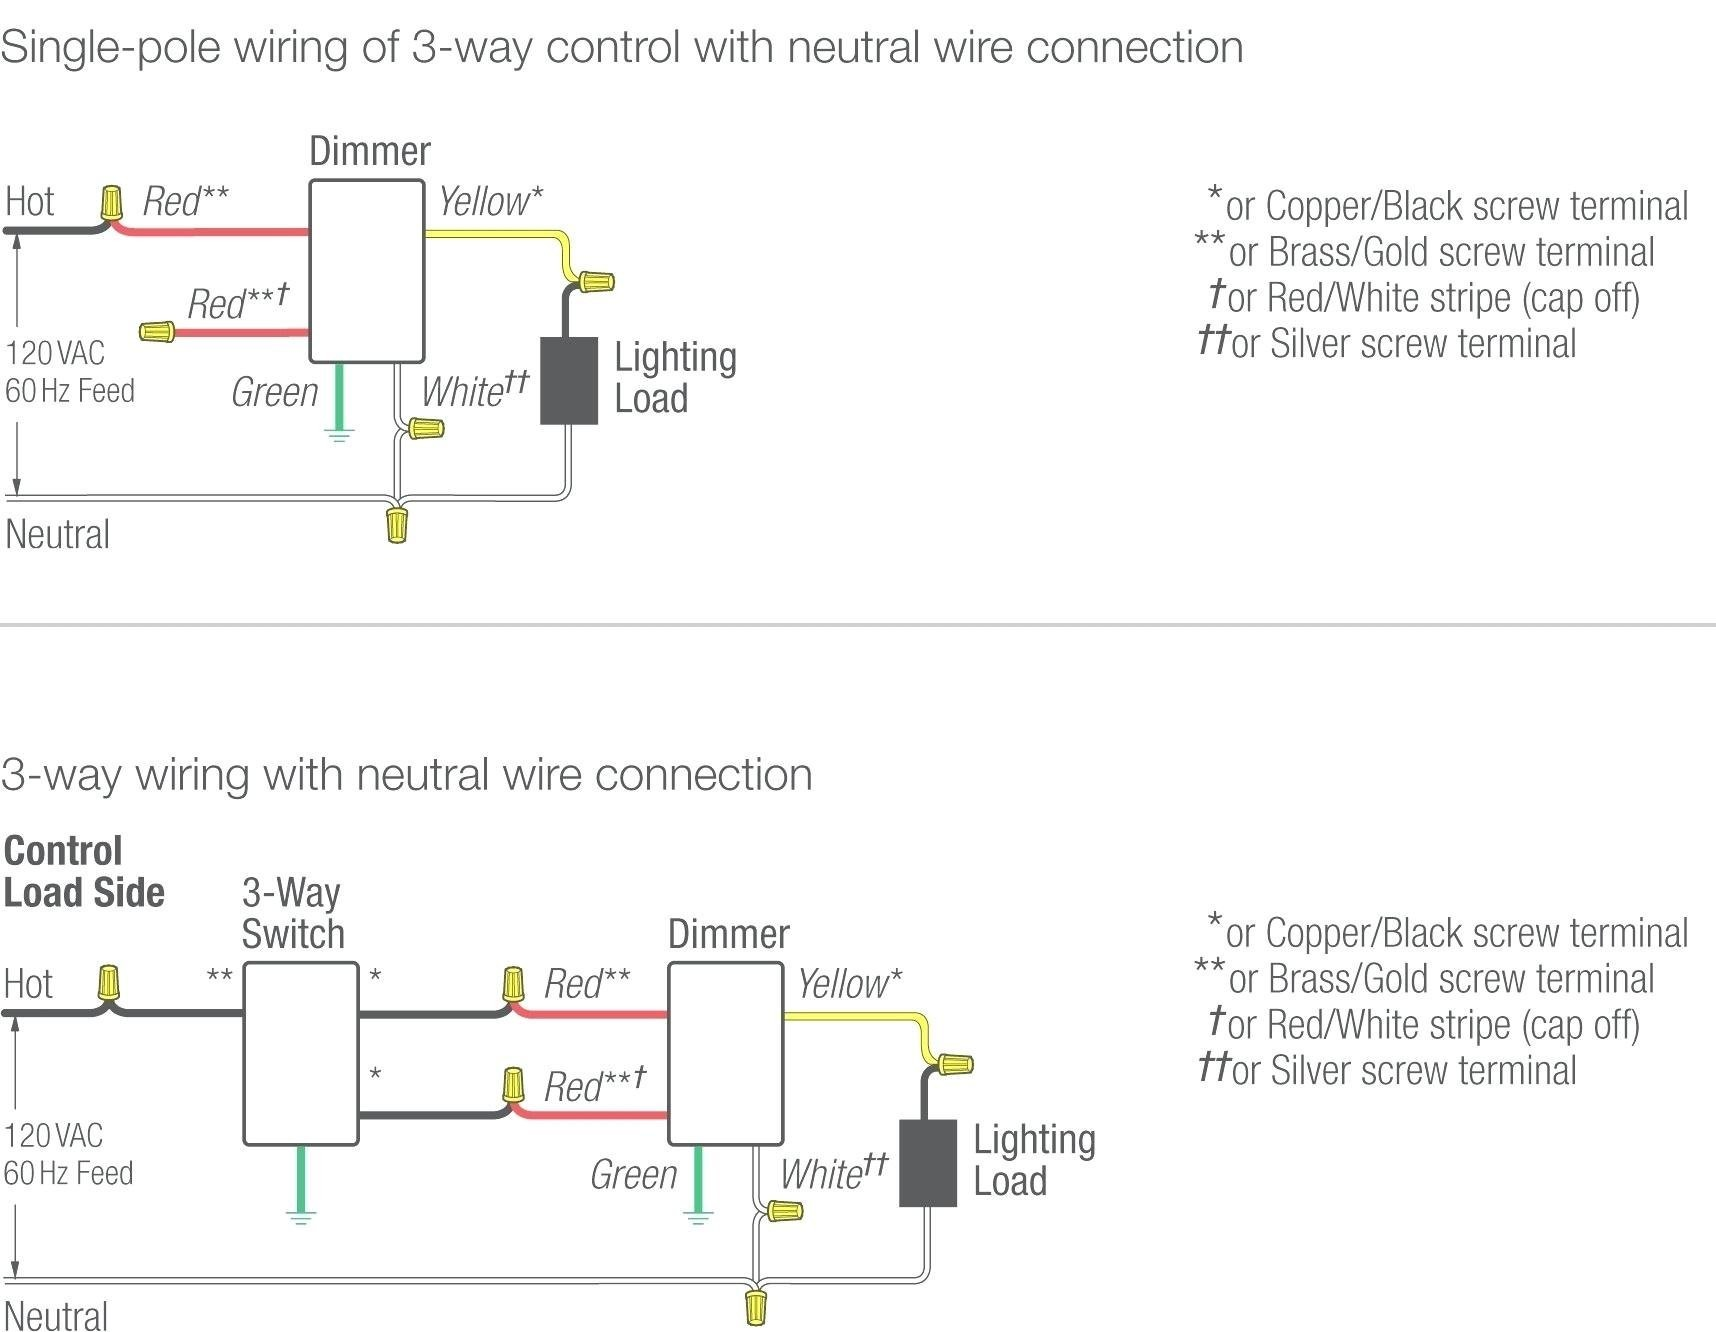 Ek 0602 Switch Wiring Diagram As Well Lutron Dimmer Switch Wiring Diagram On Free Diagram